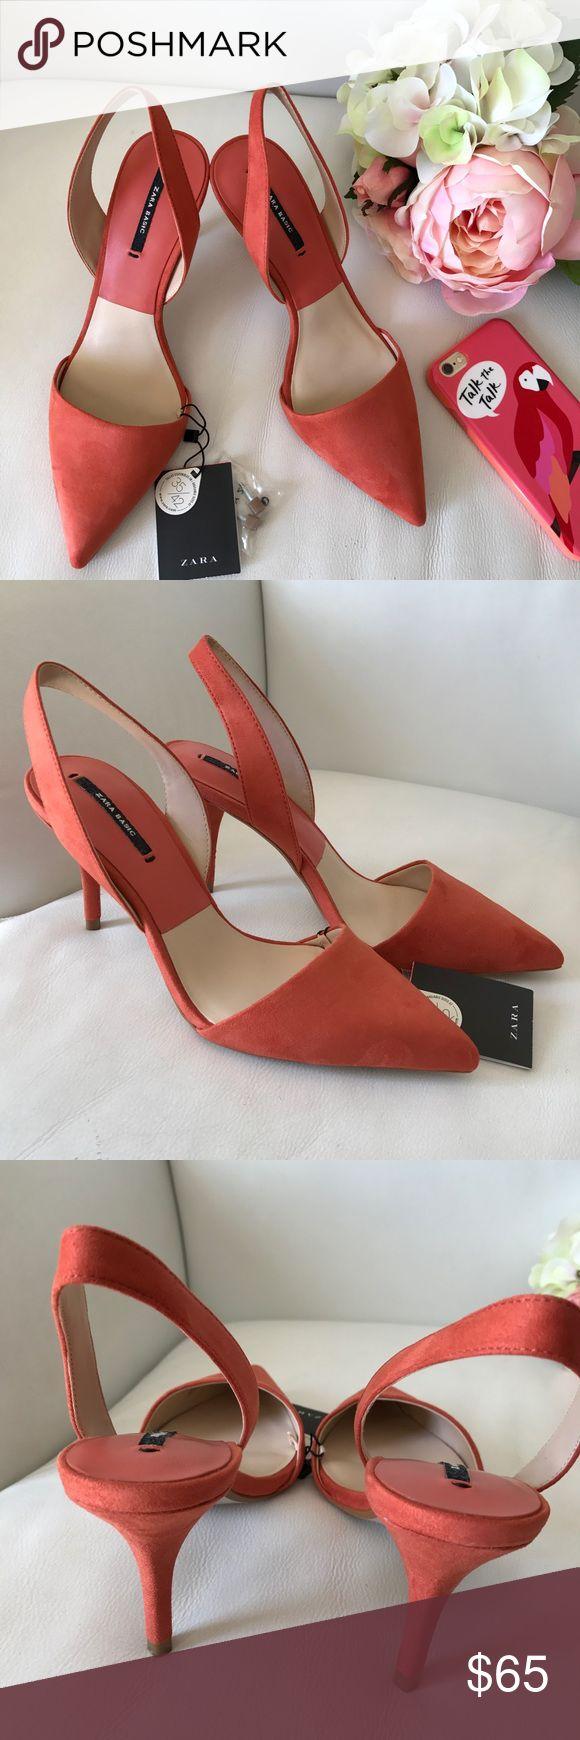 "Zara Sling back peach heels 3.5"" heel height  , SIZES 37 , 38 , 39     Offers via offer feature only ! 👍🏻  💗💗IG: iluvshoes22 💗💗  🎈🎈🎈15% off bundles 🎈🎈🎈 Zara Shoes Heels"